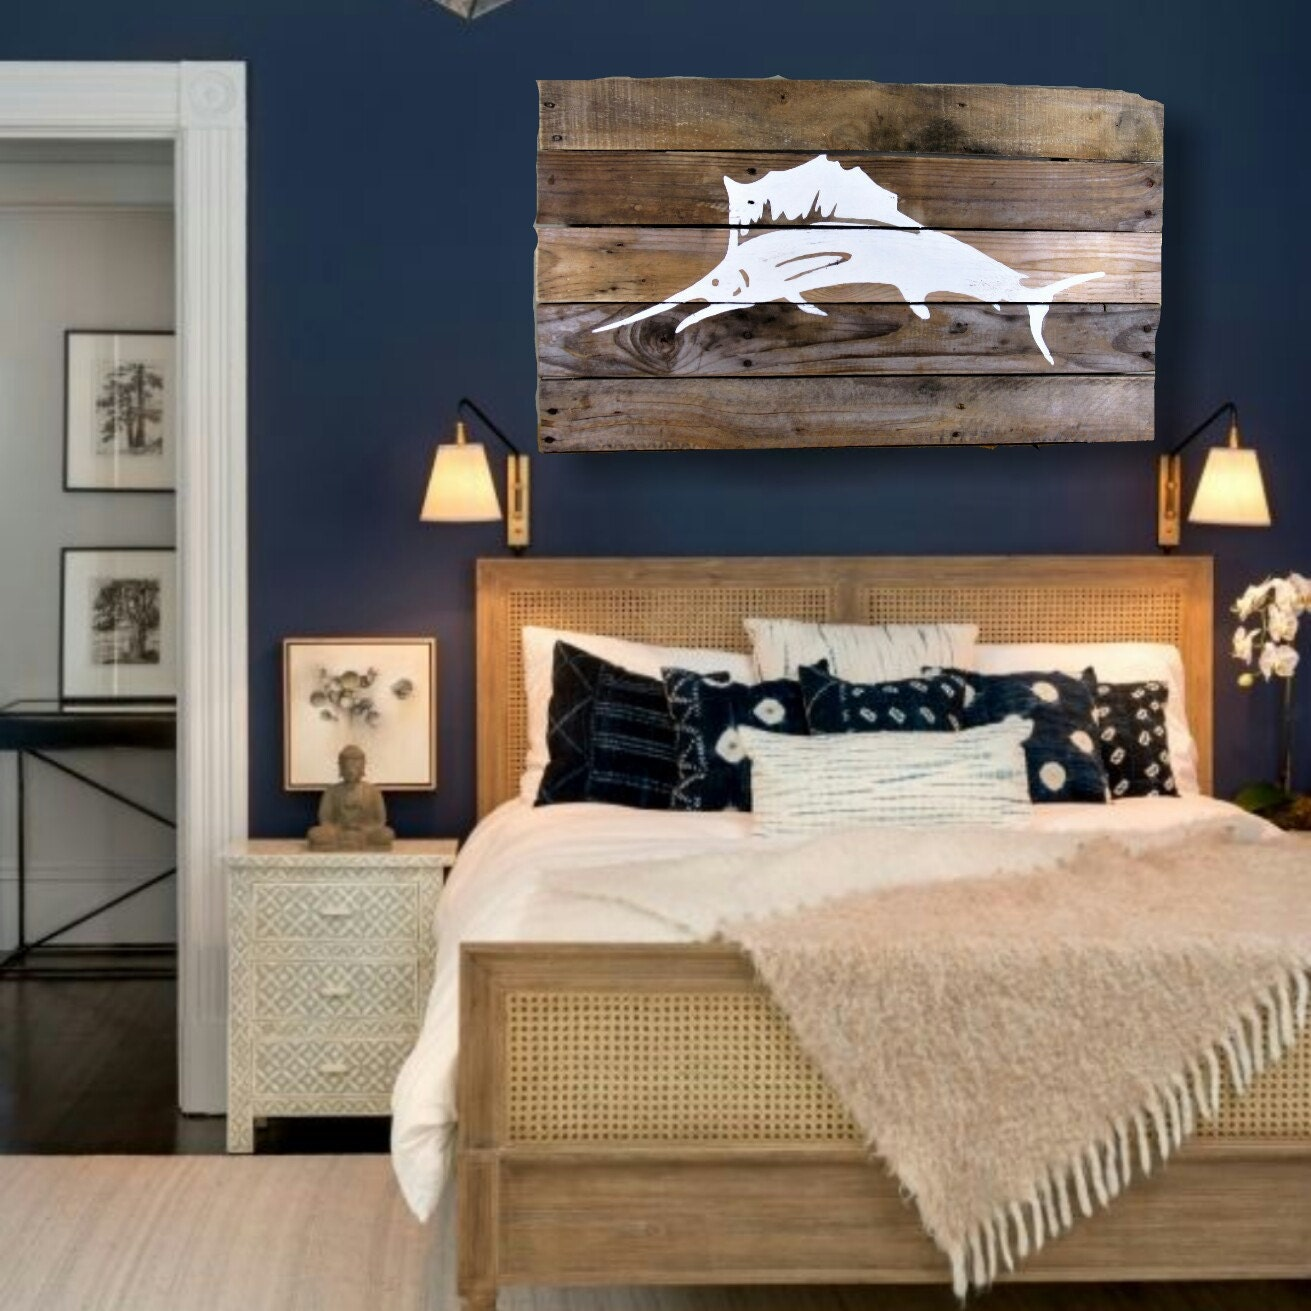 White Marlin Pallet Wall Art Nautical Home Décor Wall Décor